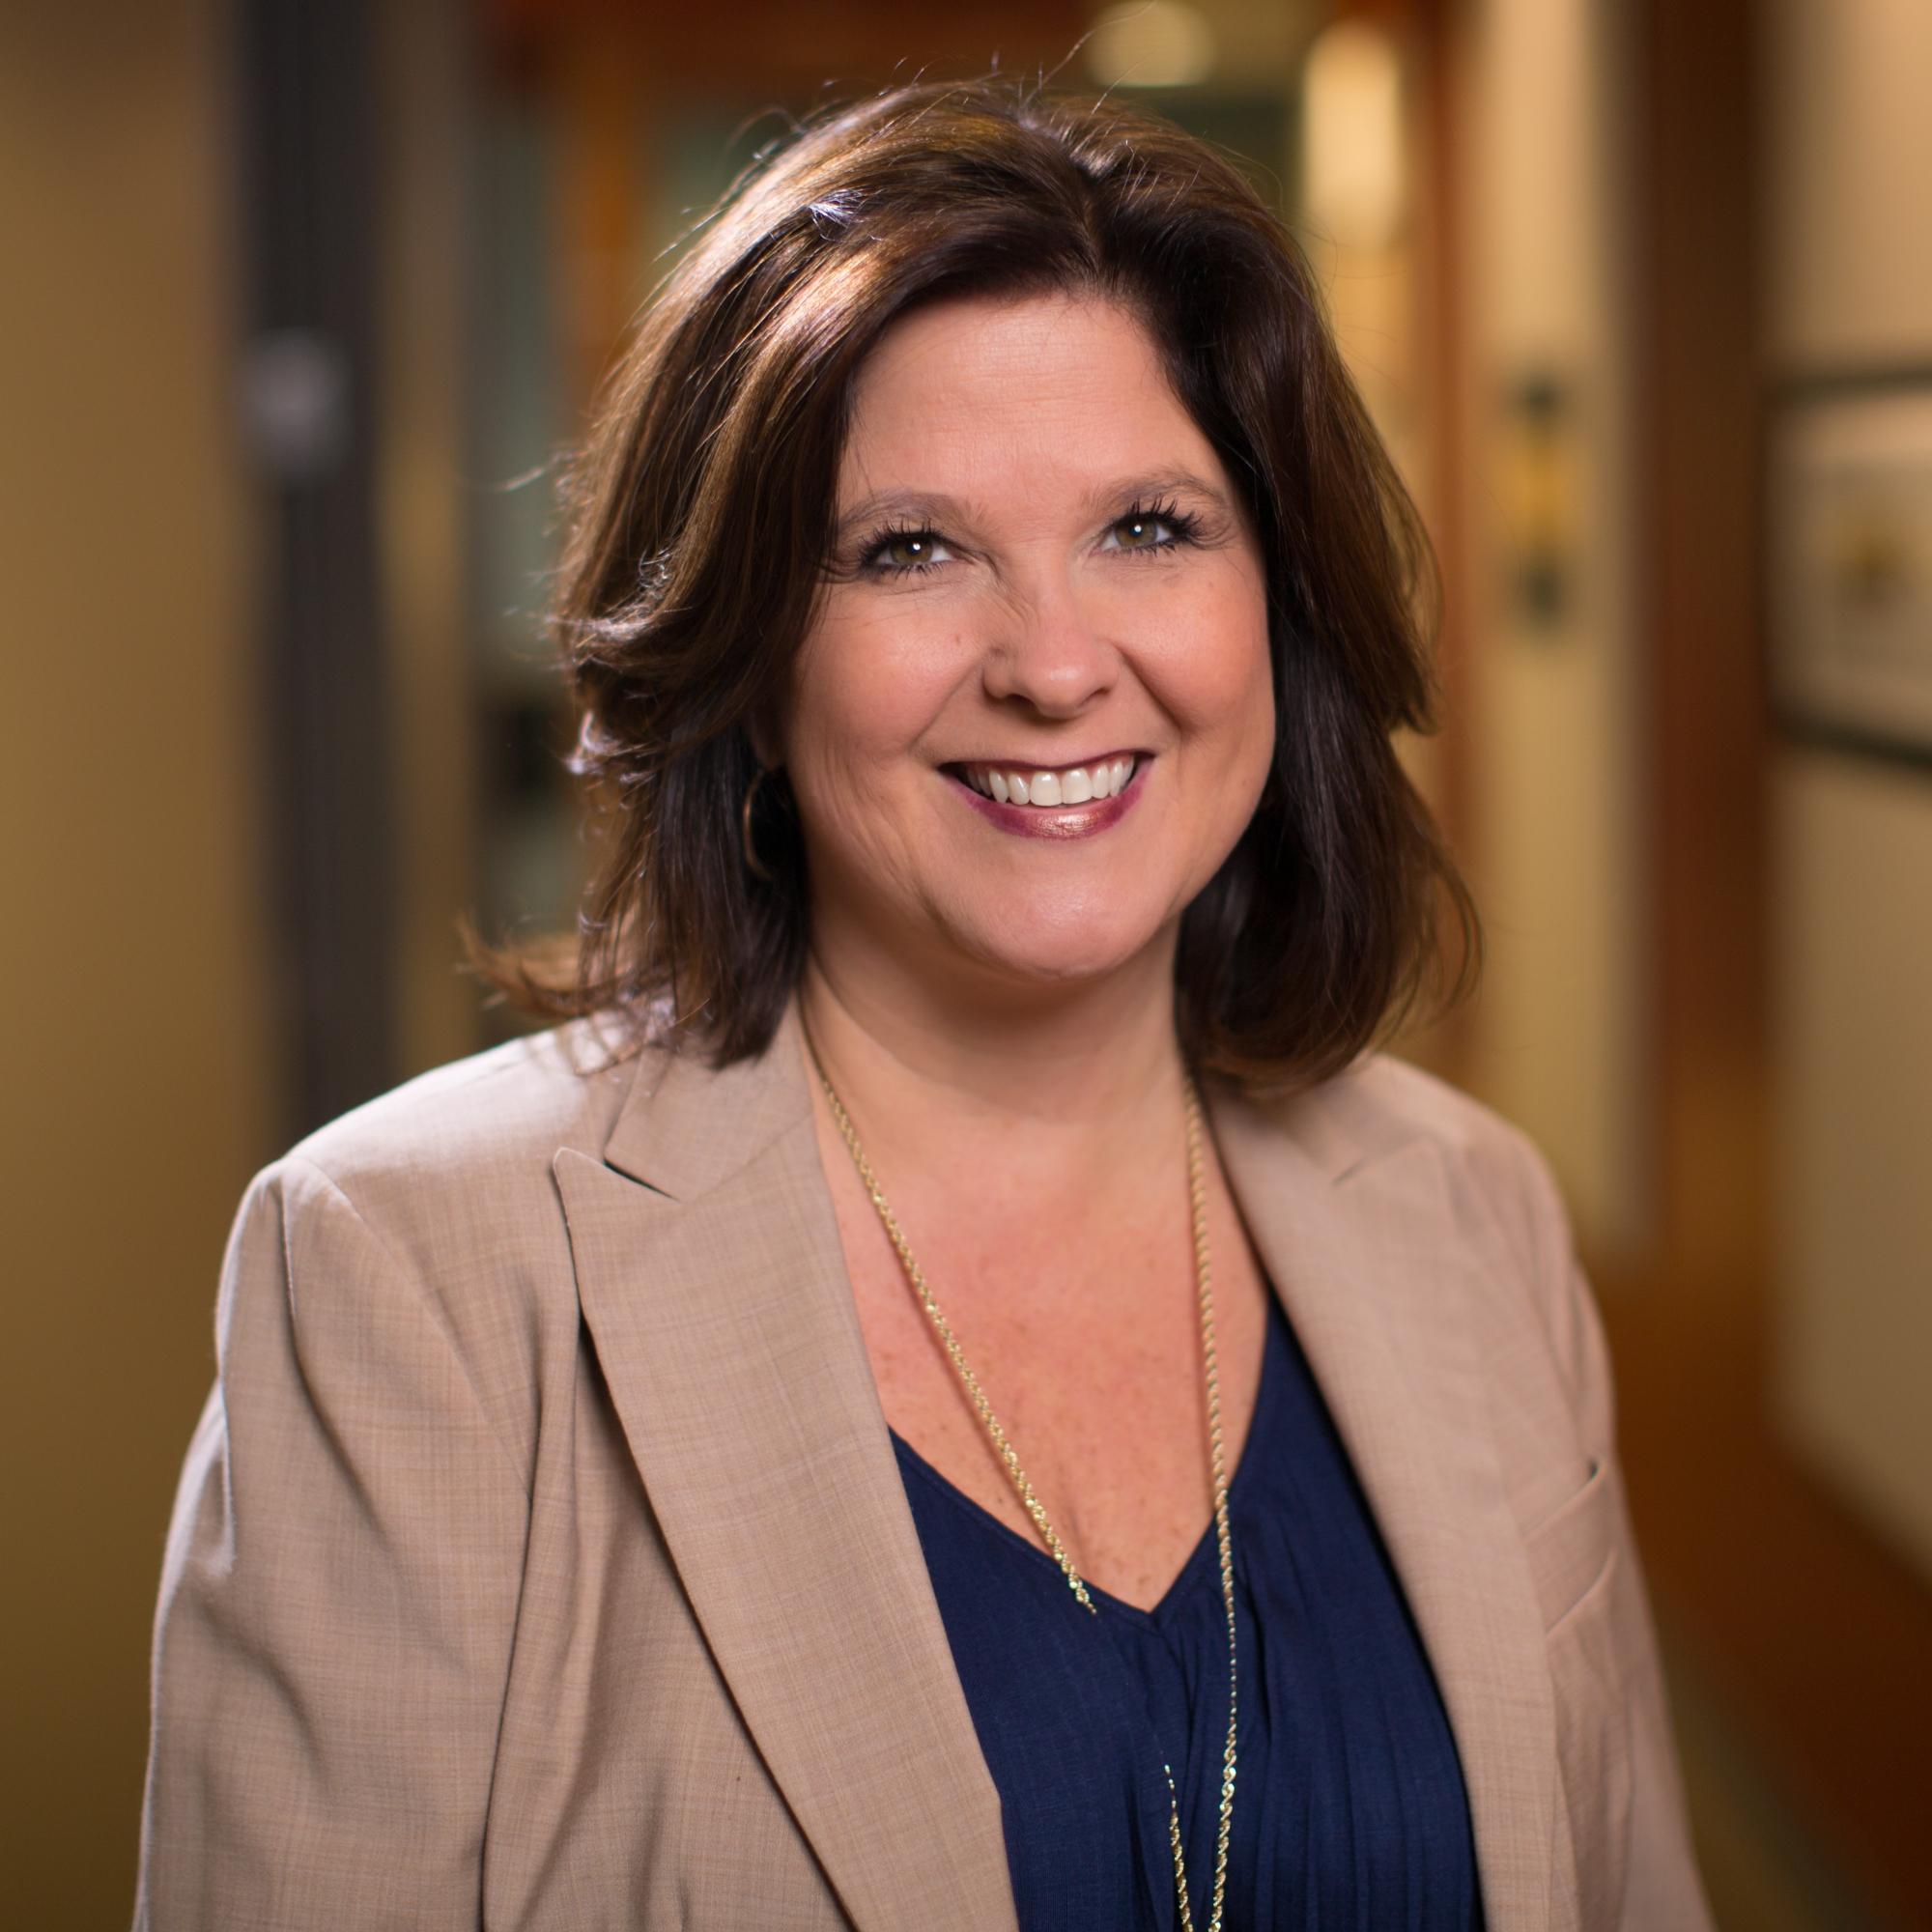 Lisa Schultz, Chief Services Officer, CNL Financial Group